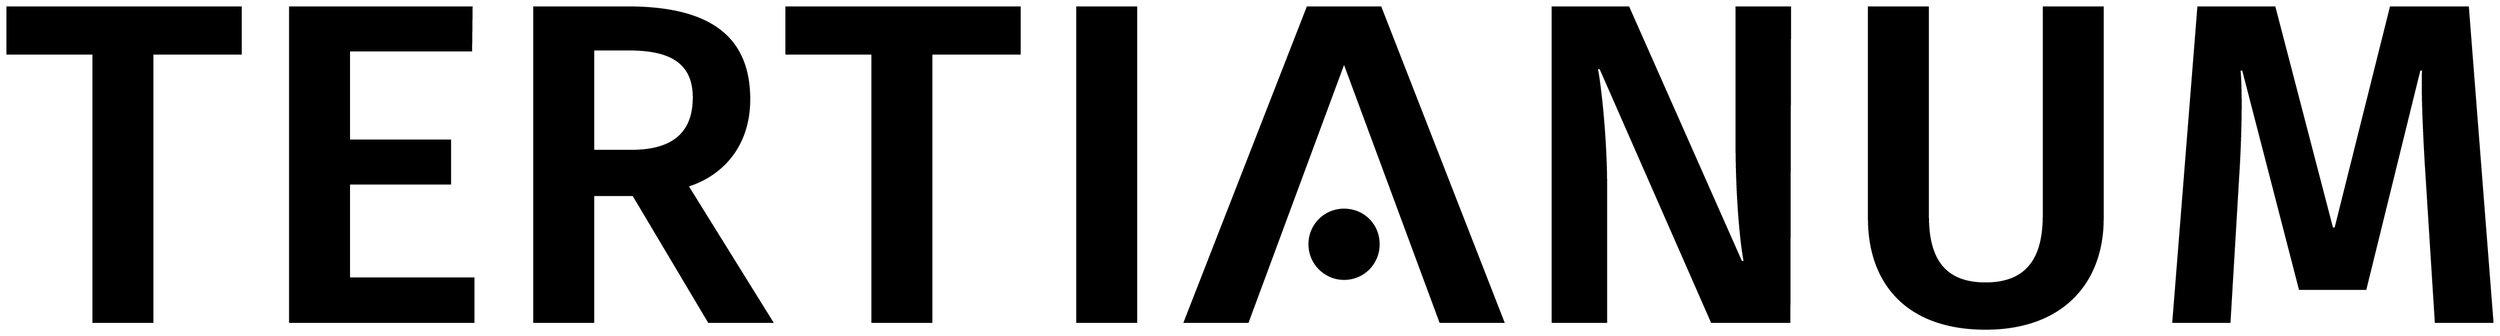 tertianum_logo_schwarz_1c.jpg